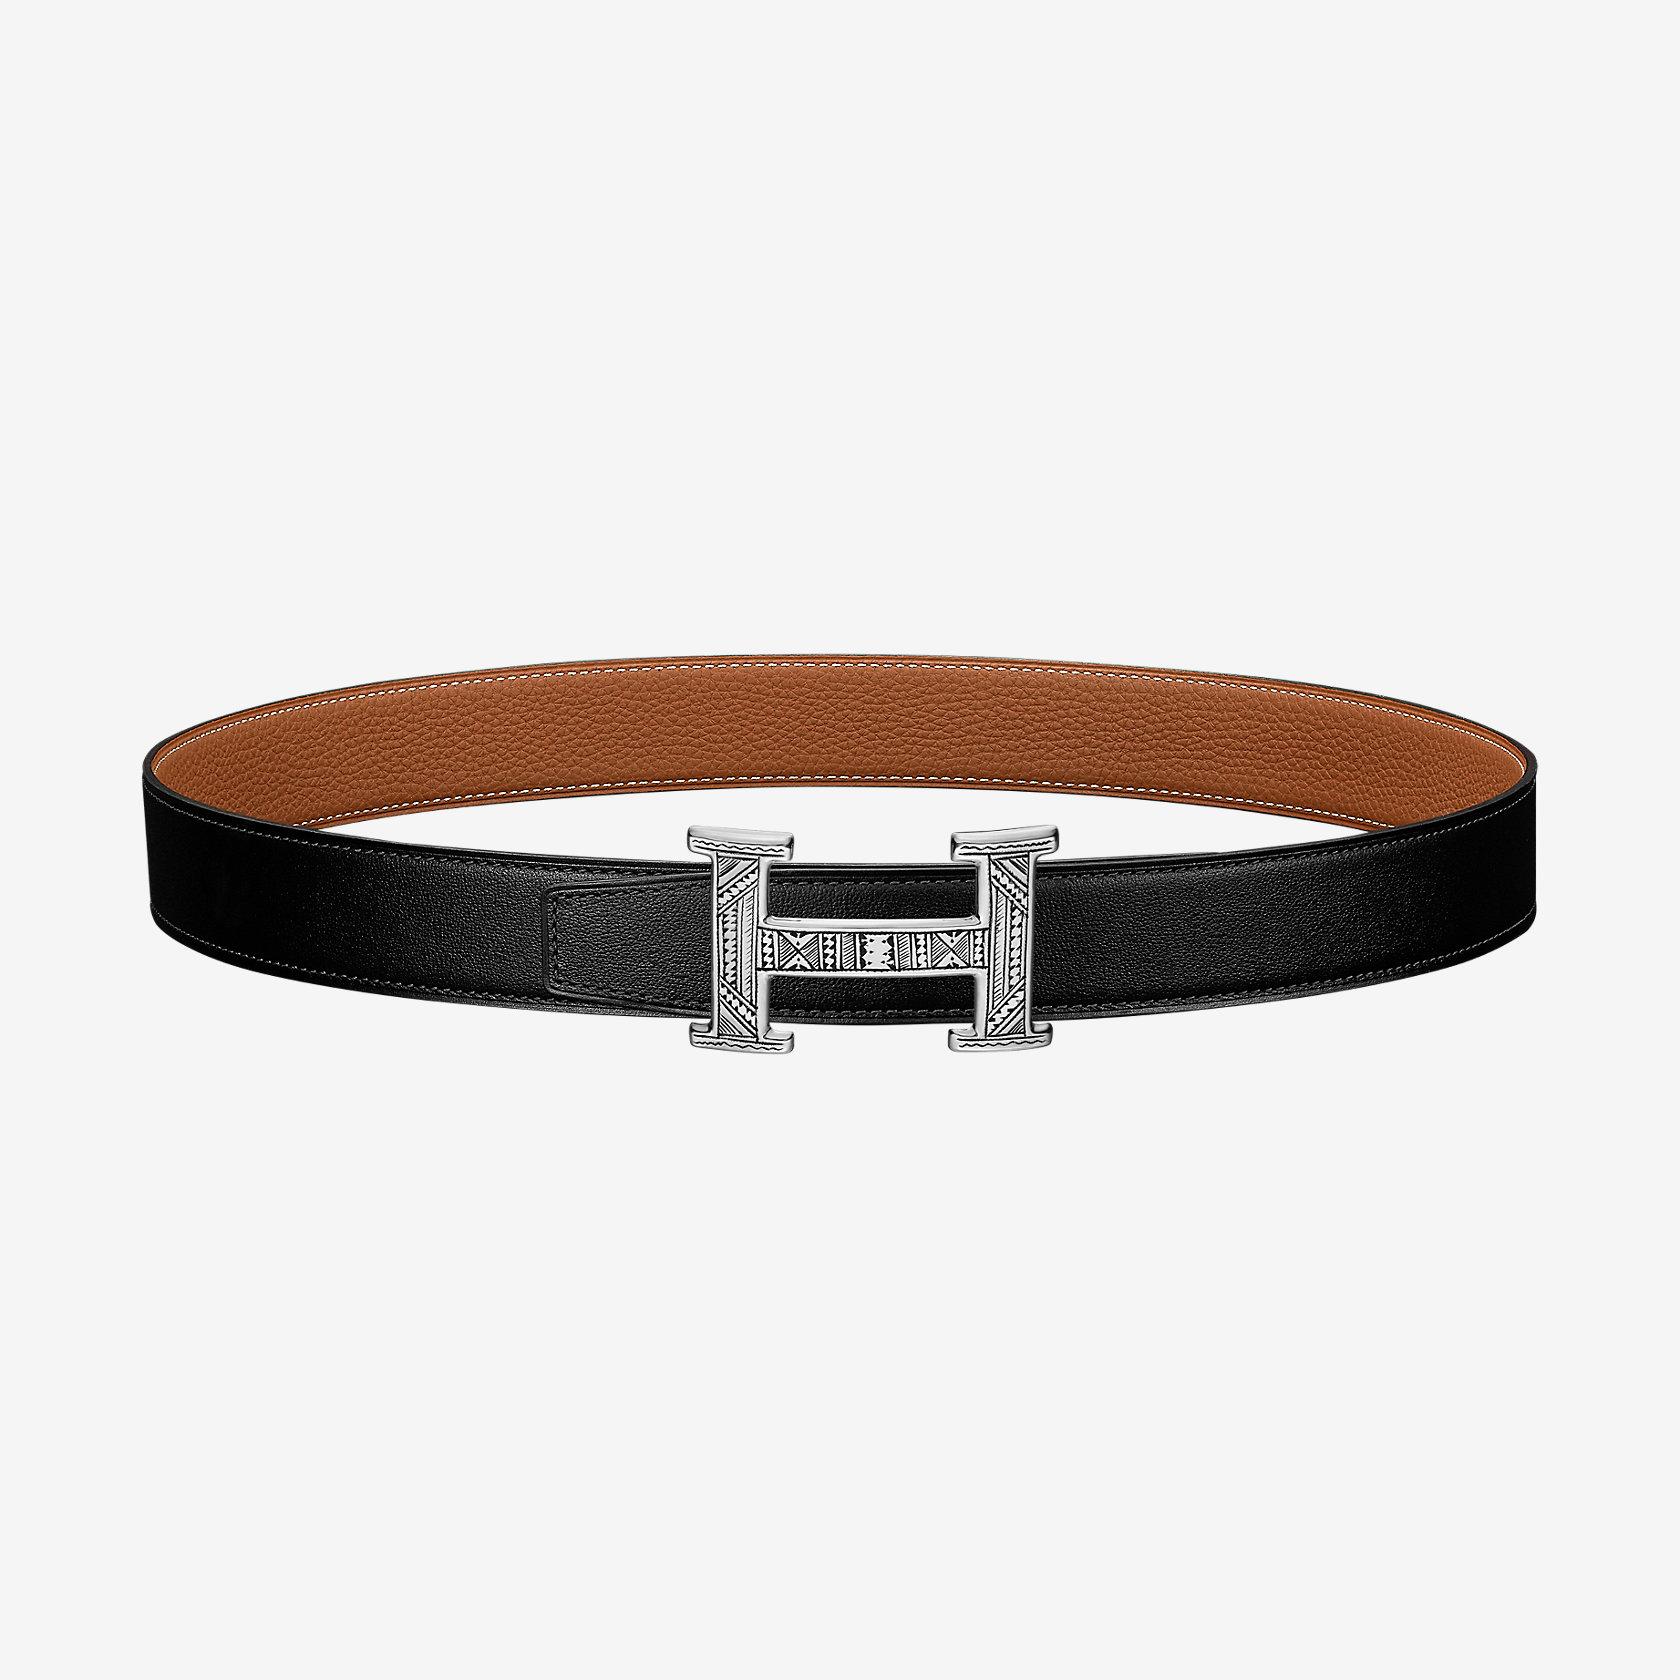 Touareg belt buckle & Reversible leather strap 32 mm